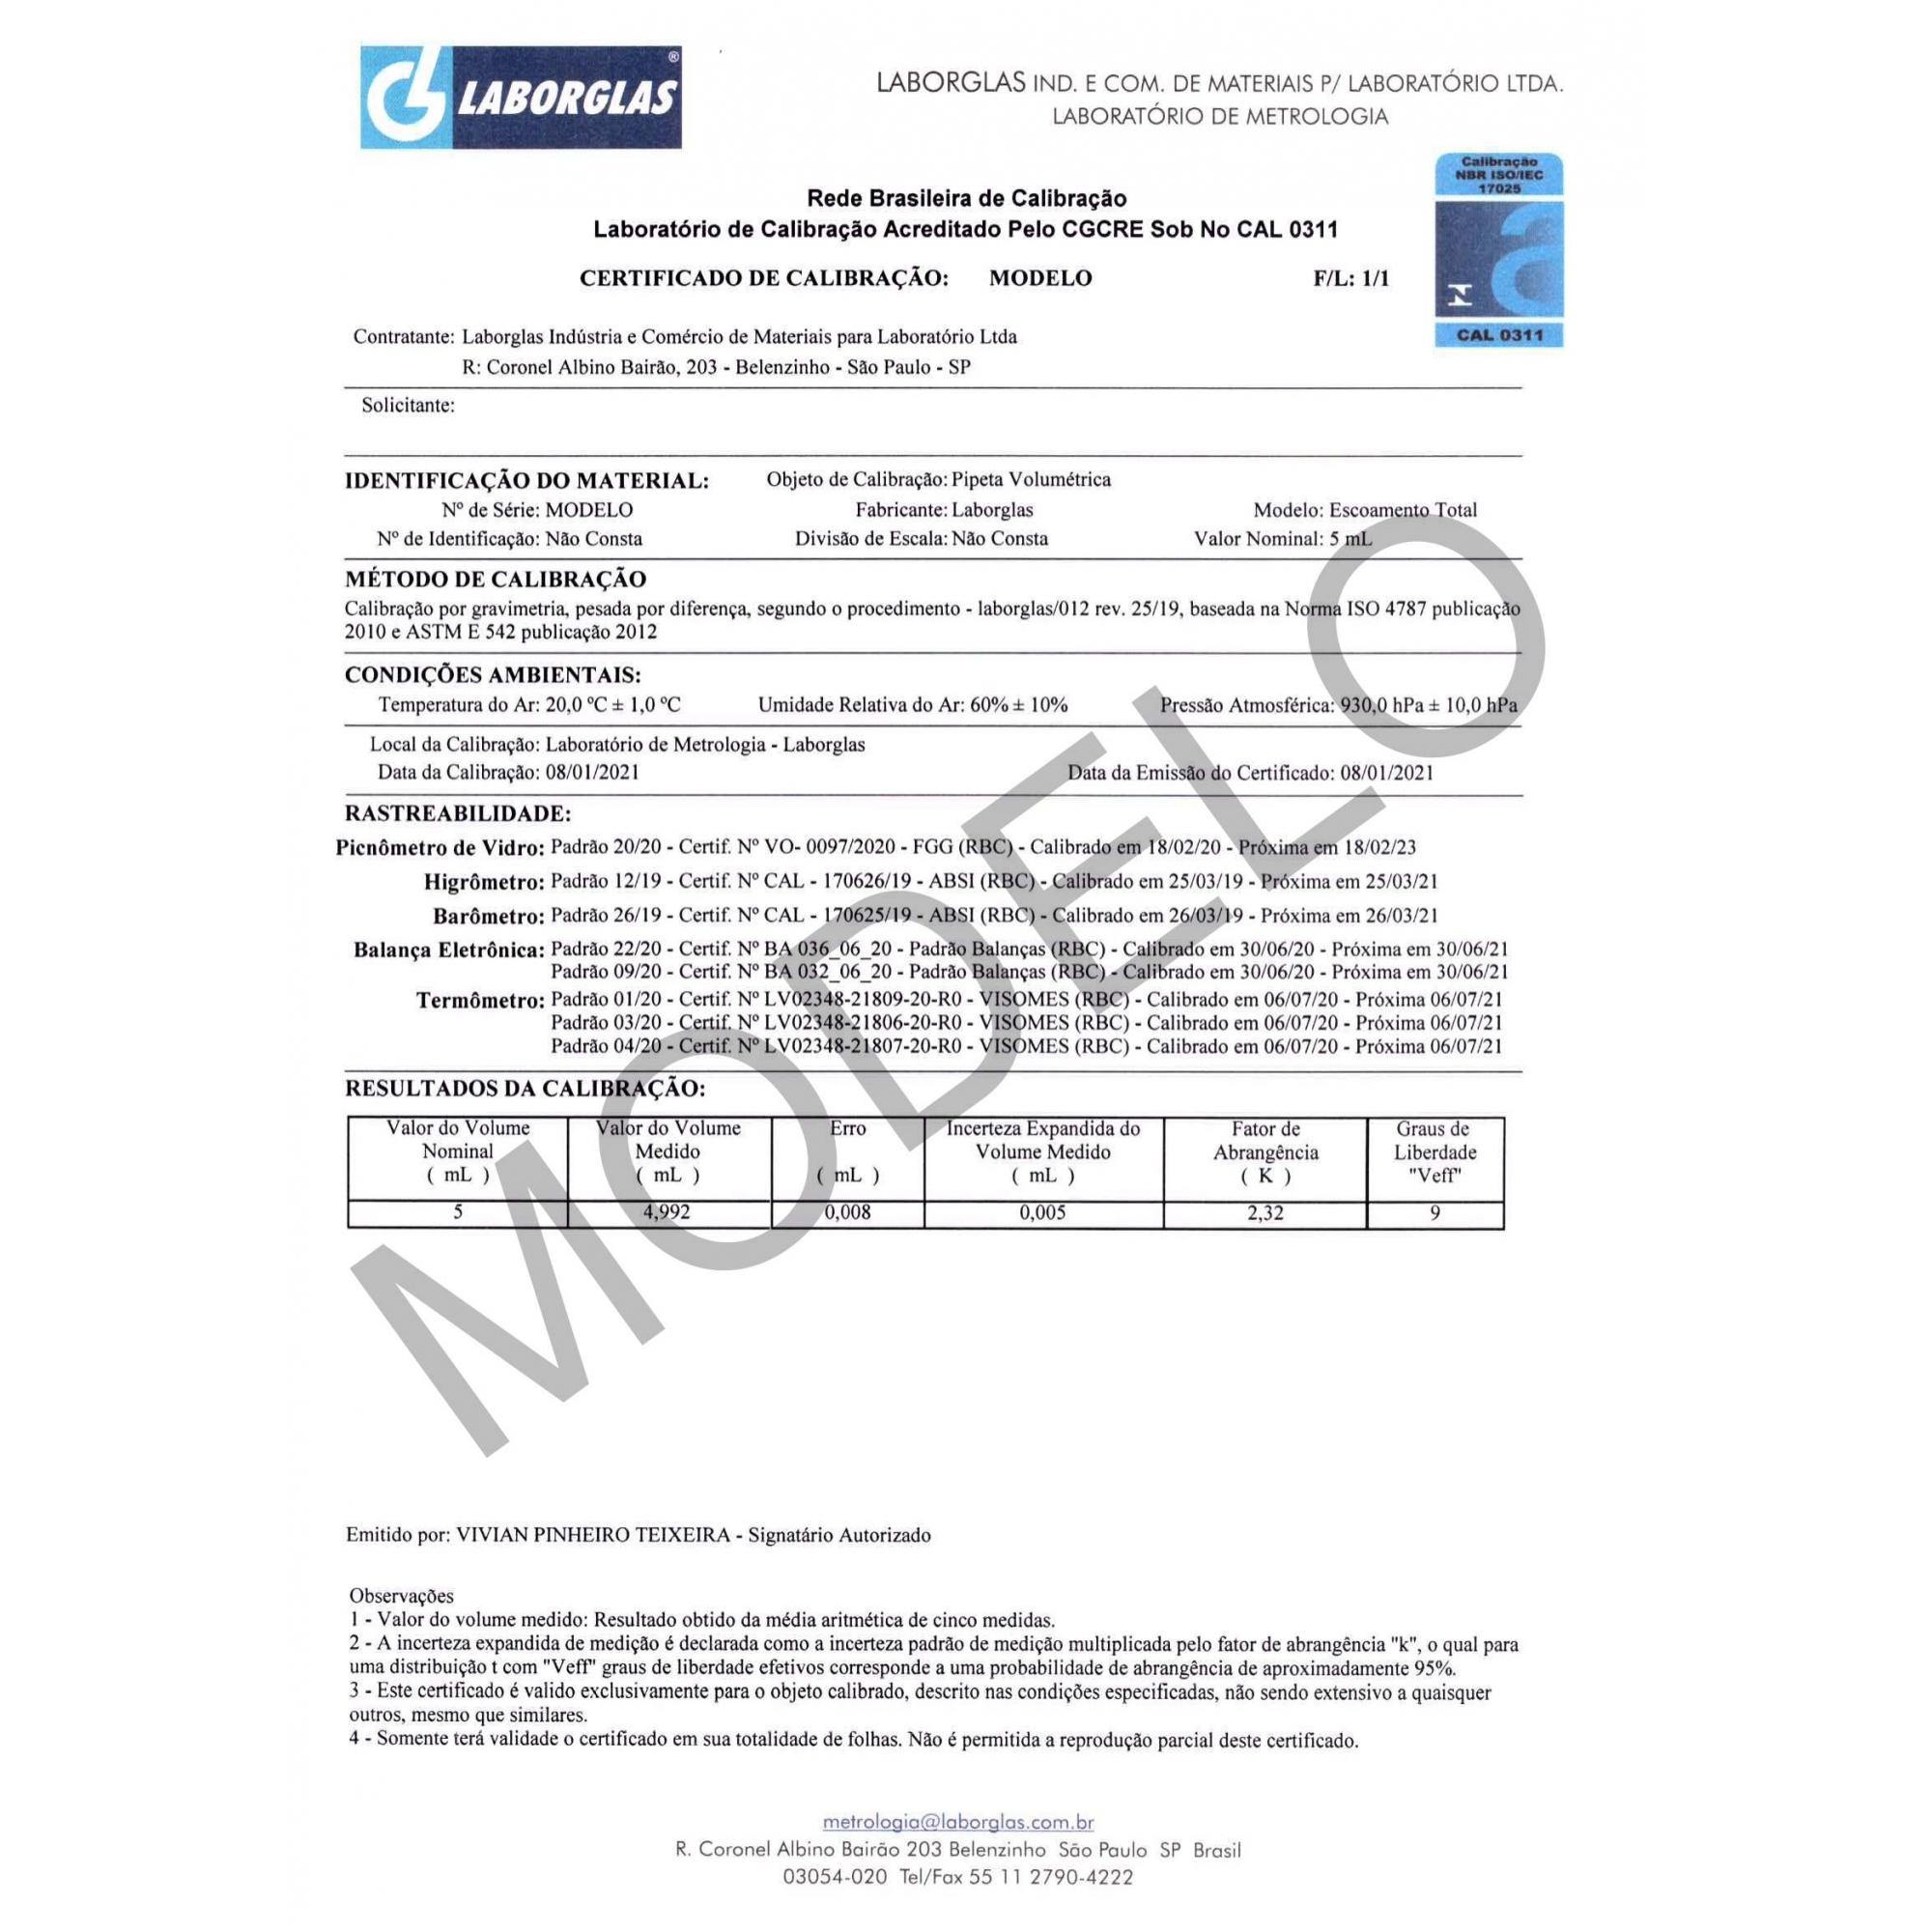 PIPETA VOLUMÉTRICA ESGOTAMENTO TOTAL 6,5 ML CERTIFICADO RBC - Laborglas - Cód. 9433724-R